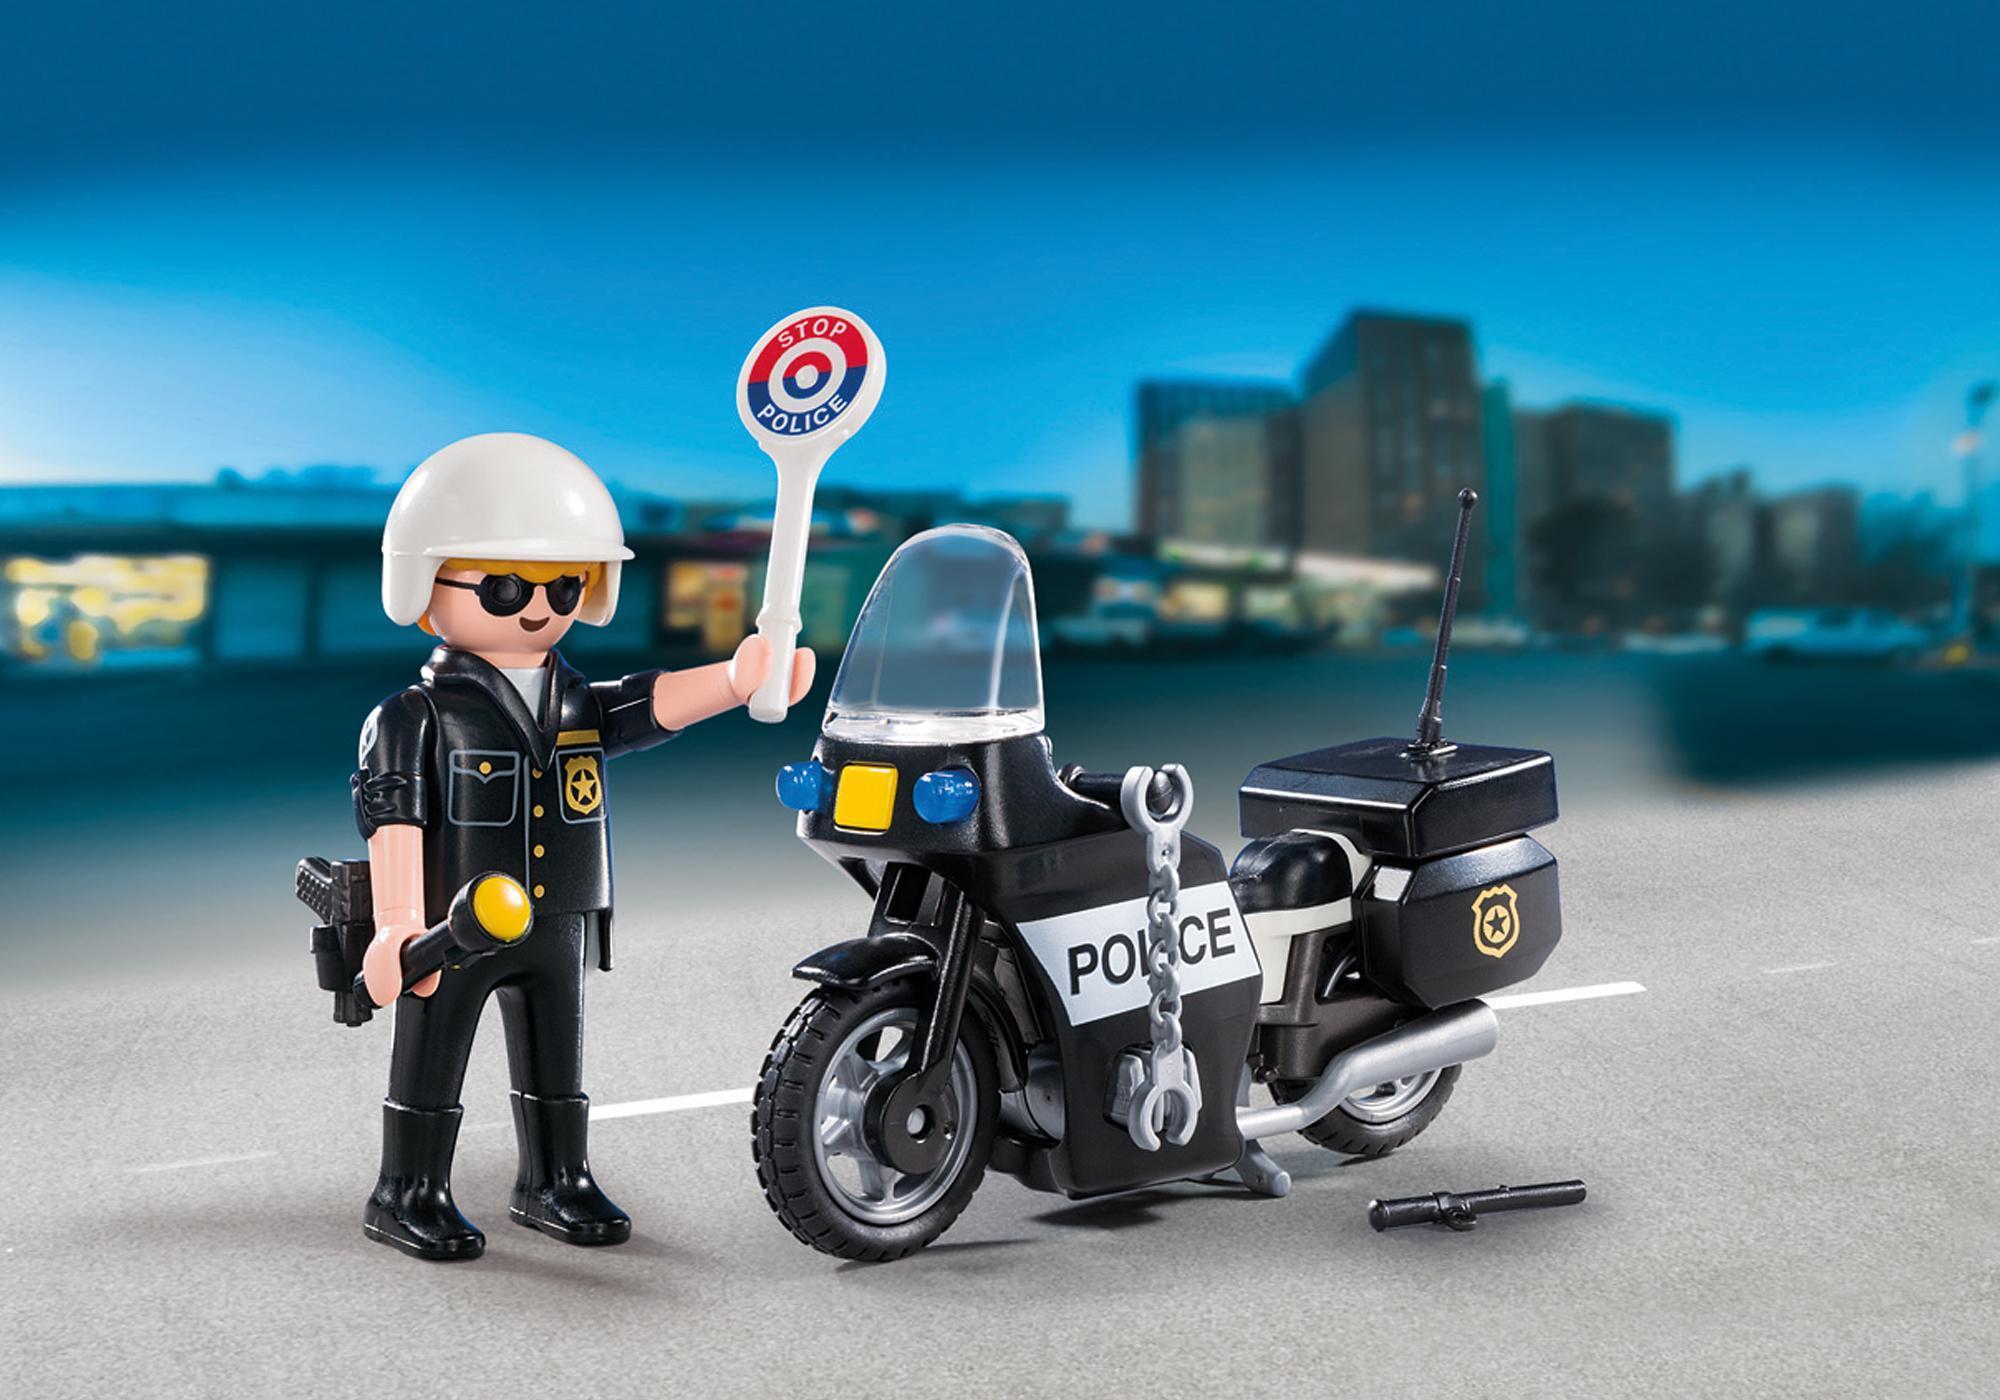 5648_product_detail/Βαλιτσάκι Αστυνόμος με μοτοσικλέτα